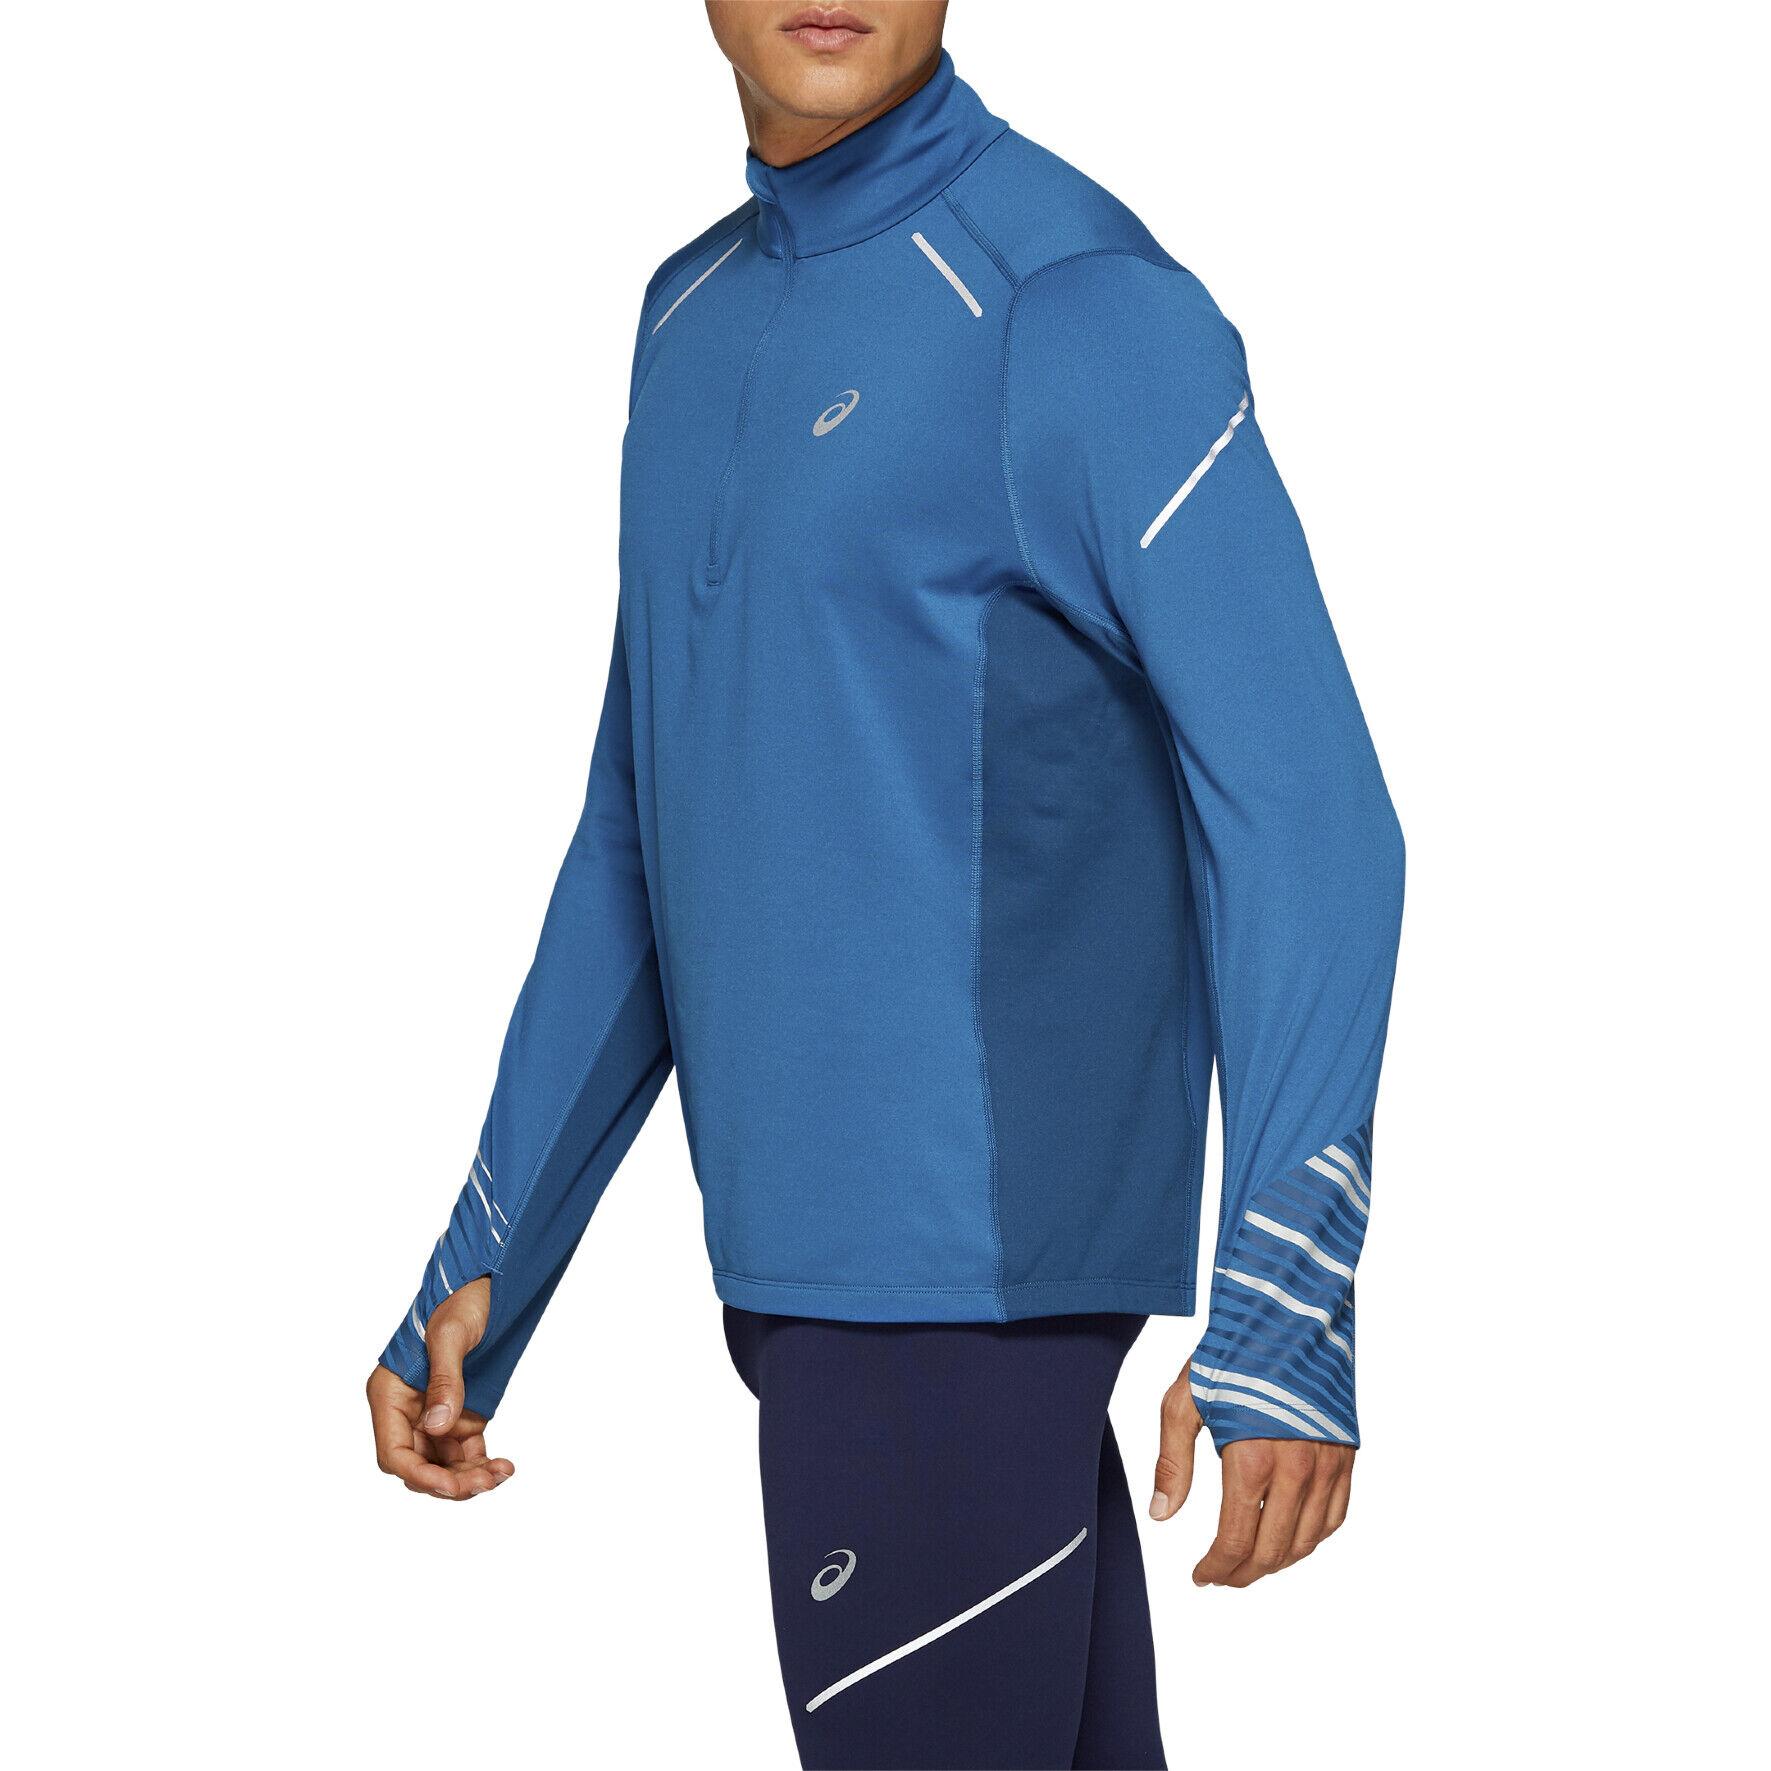 Asics Liteshow Mens Blue Half Zip Long Sleeve Running